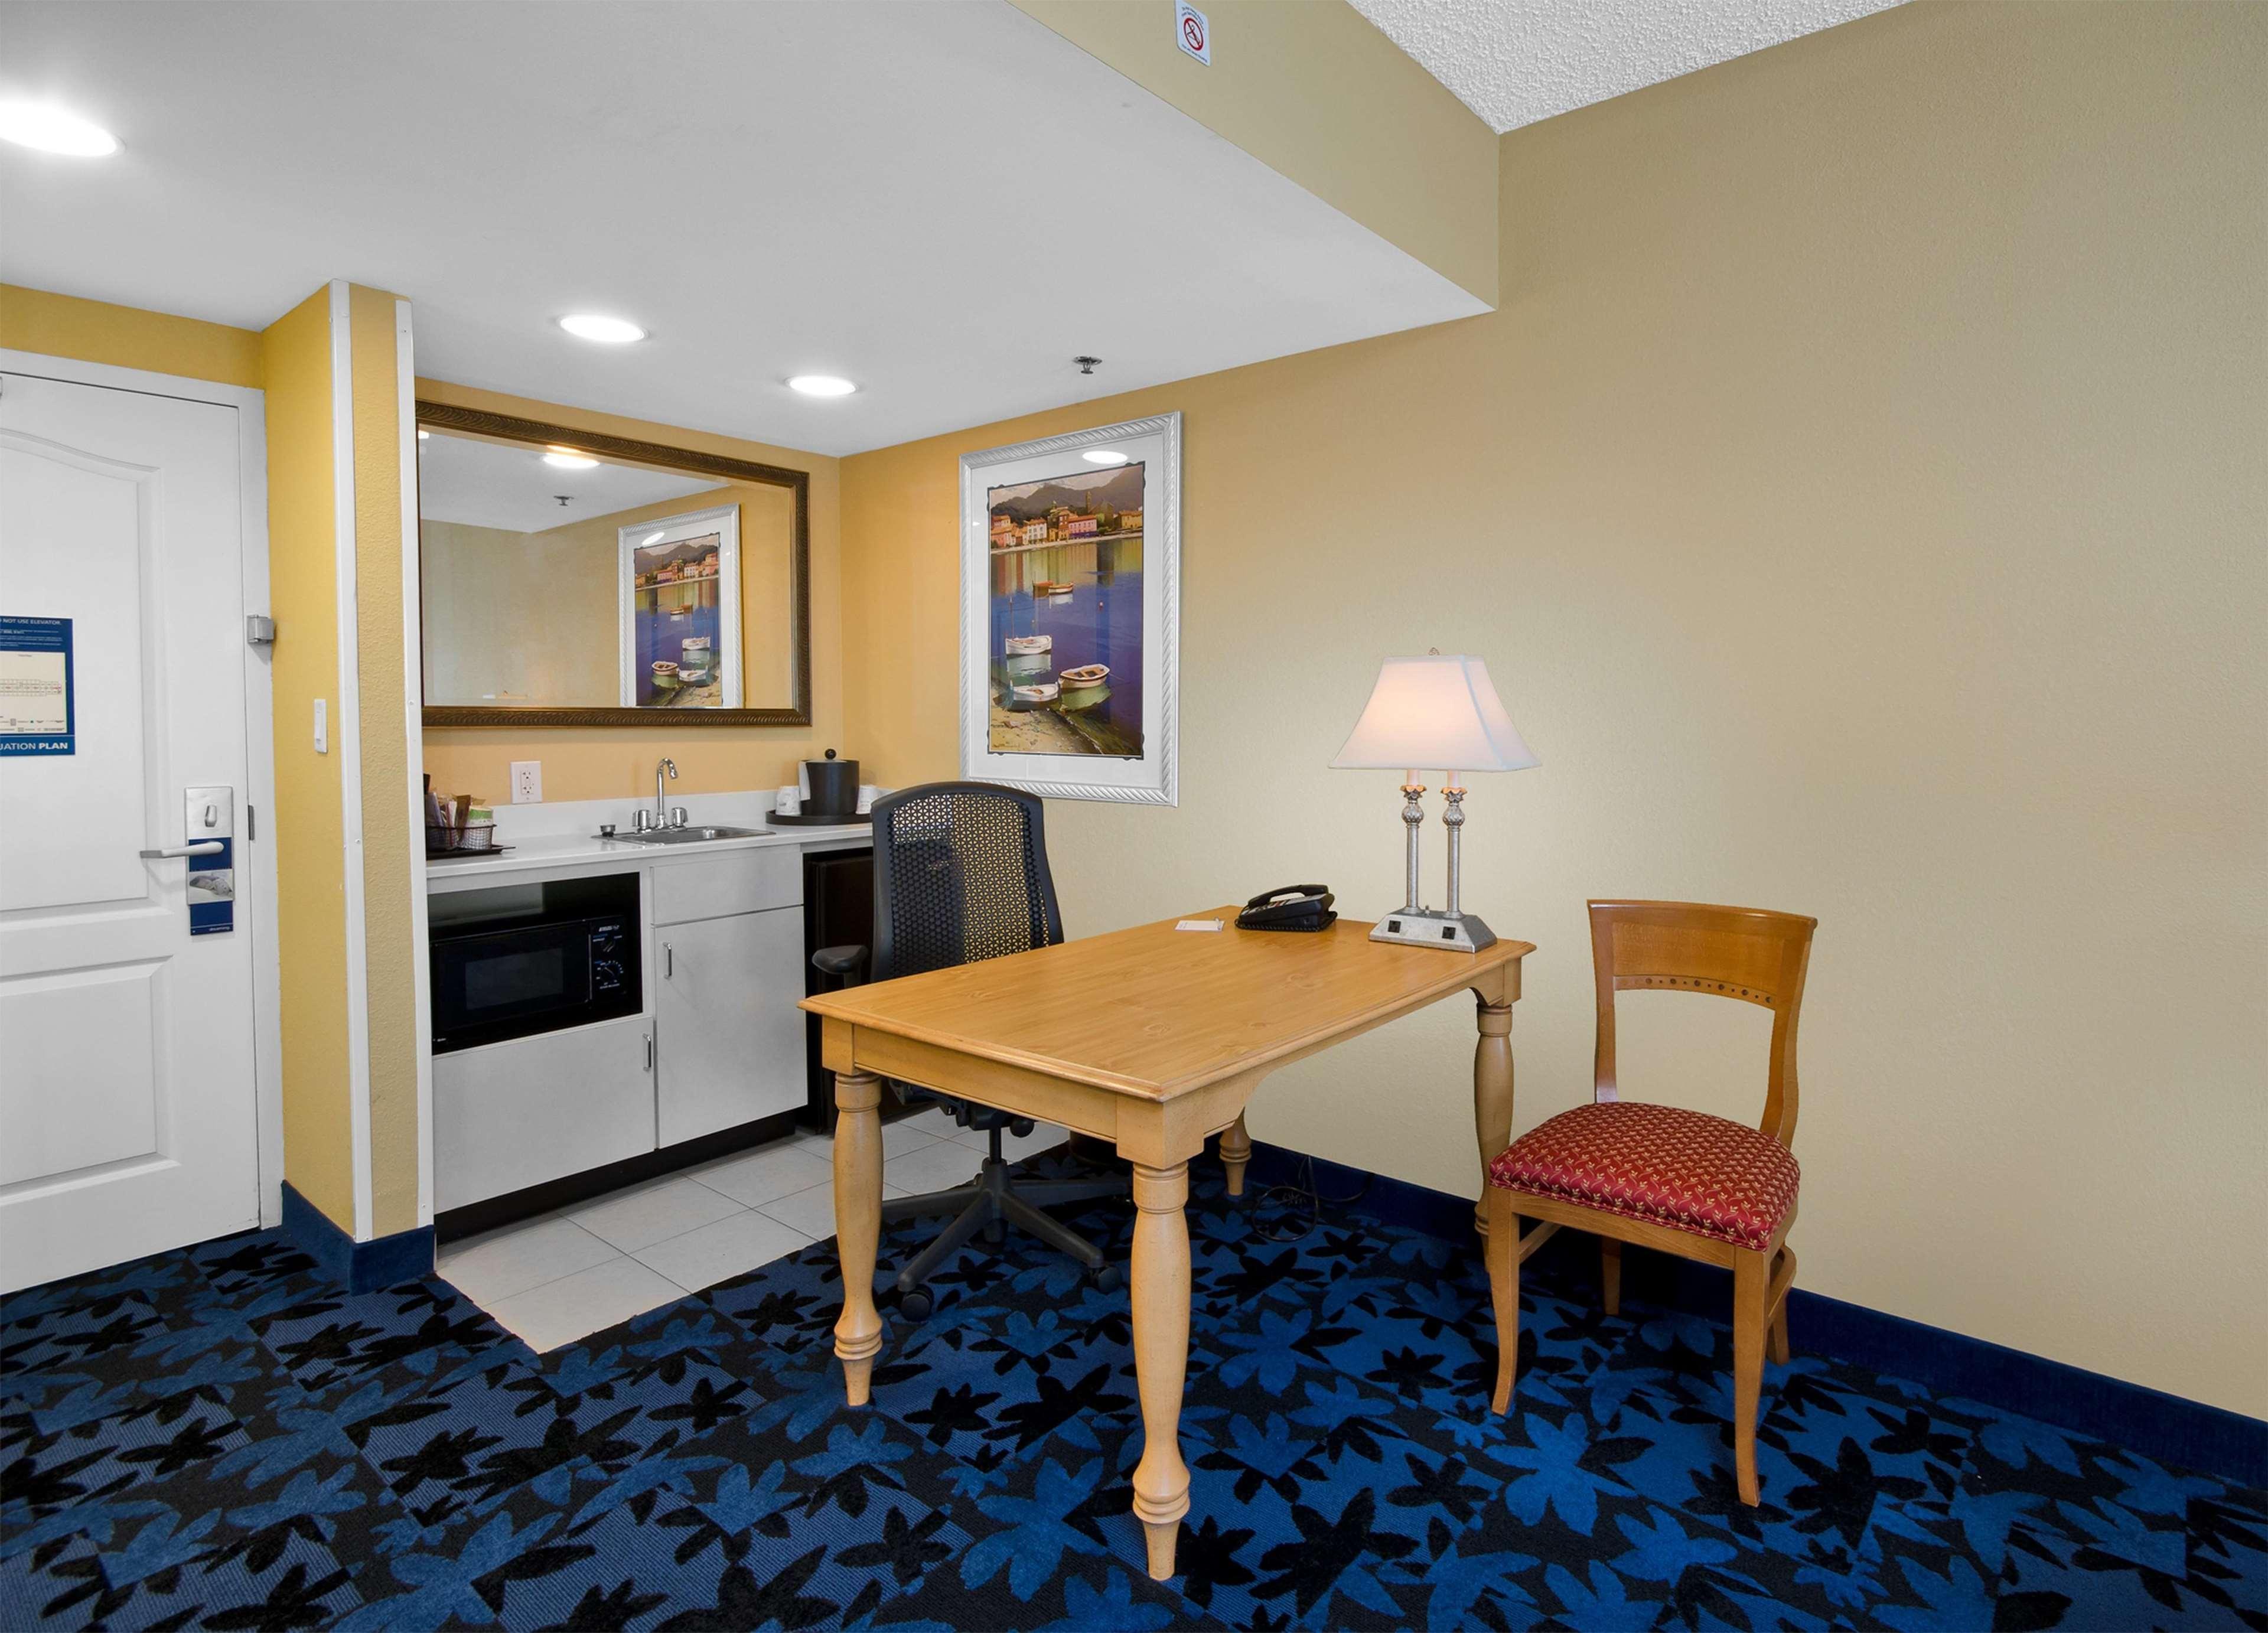 Hampton Inn & Suites Jacksonville South-St. Johns Town Center Area image 36